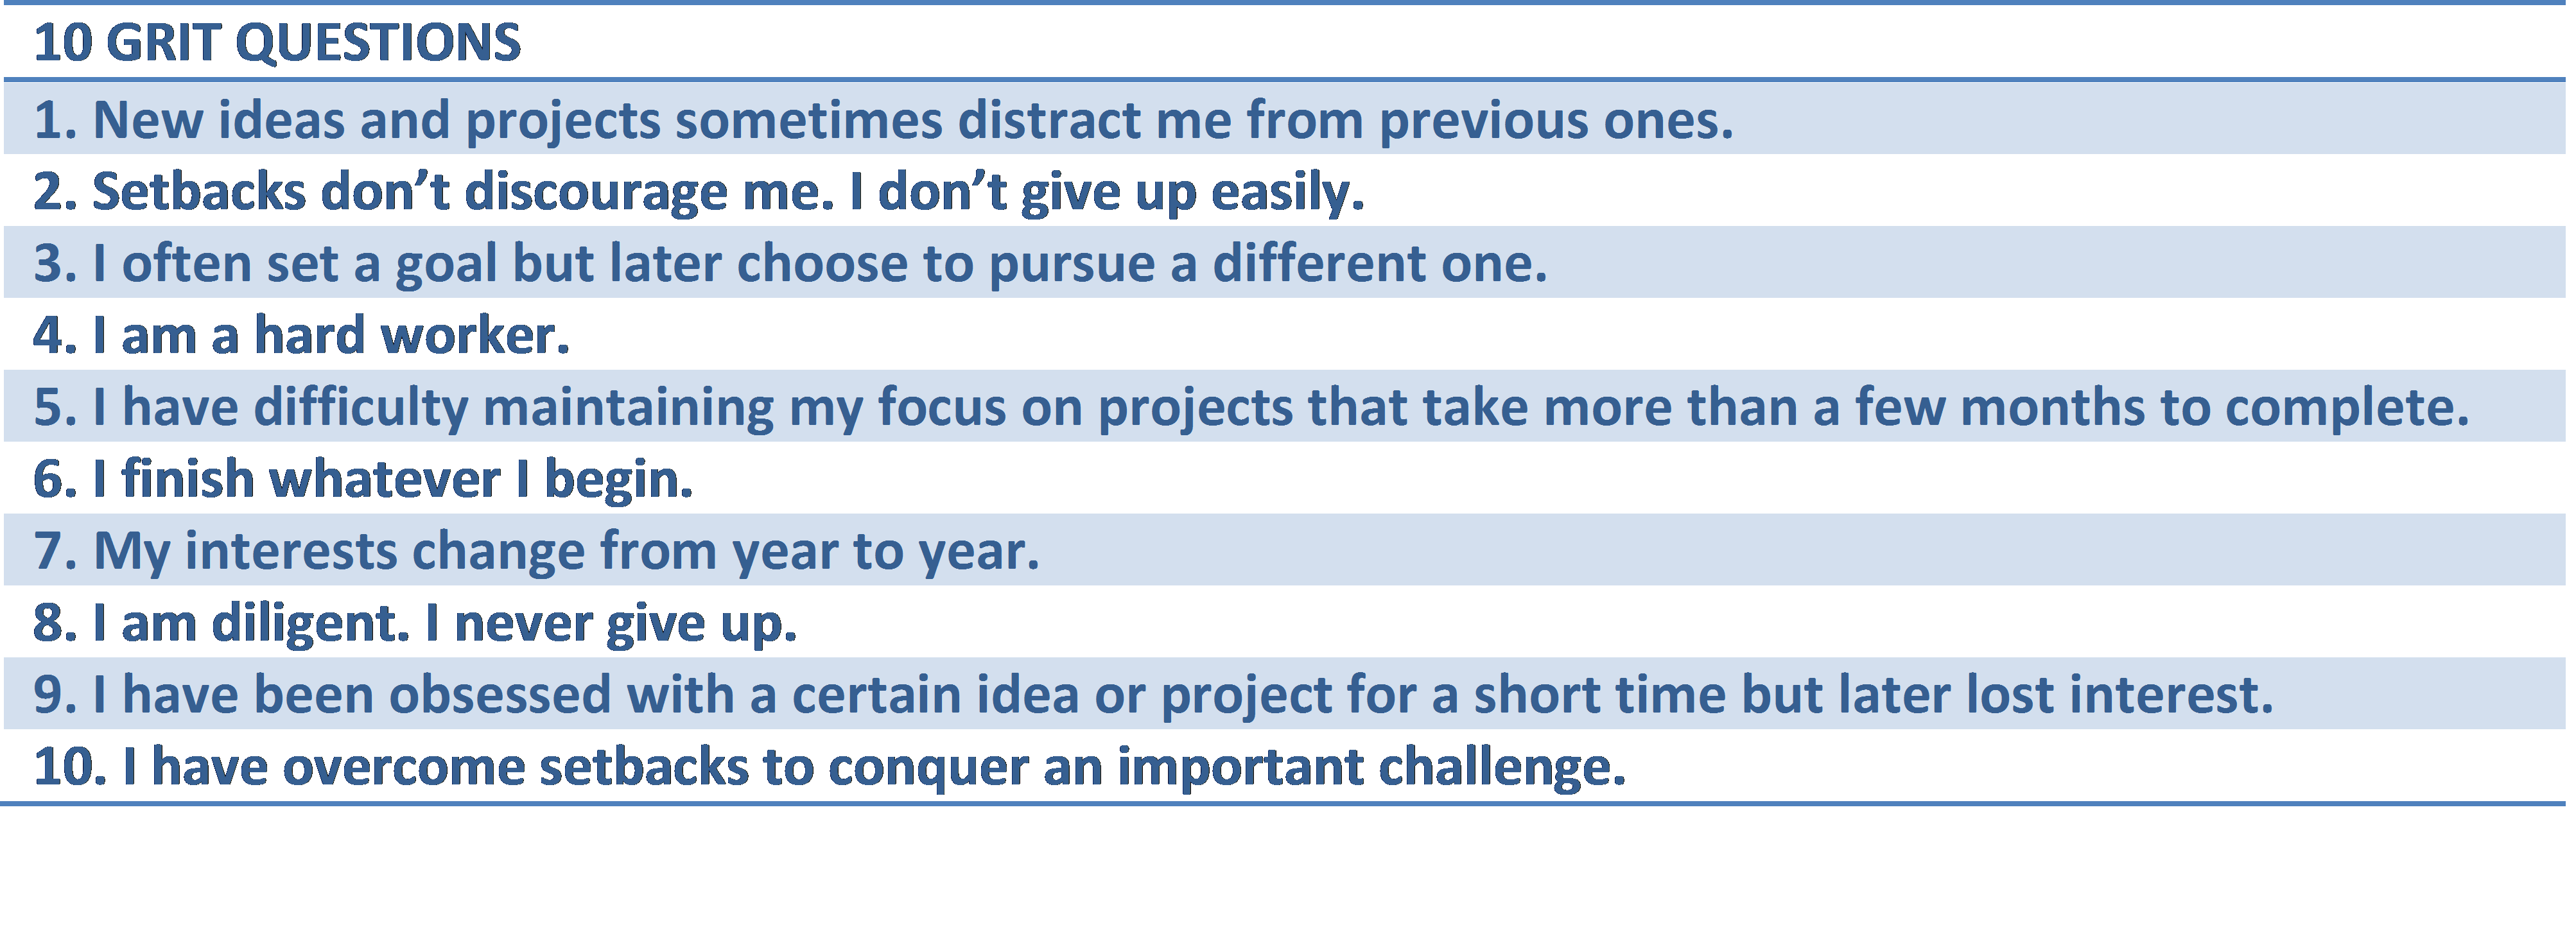 10 Grit Questions